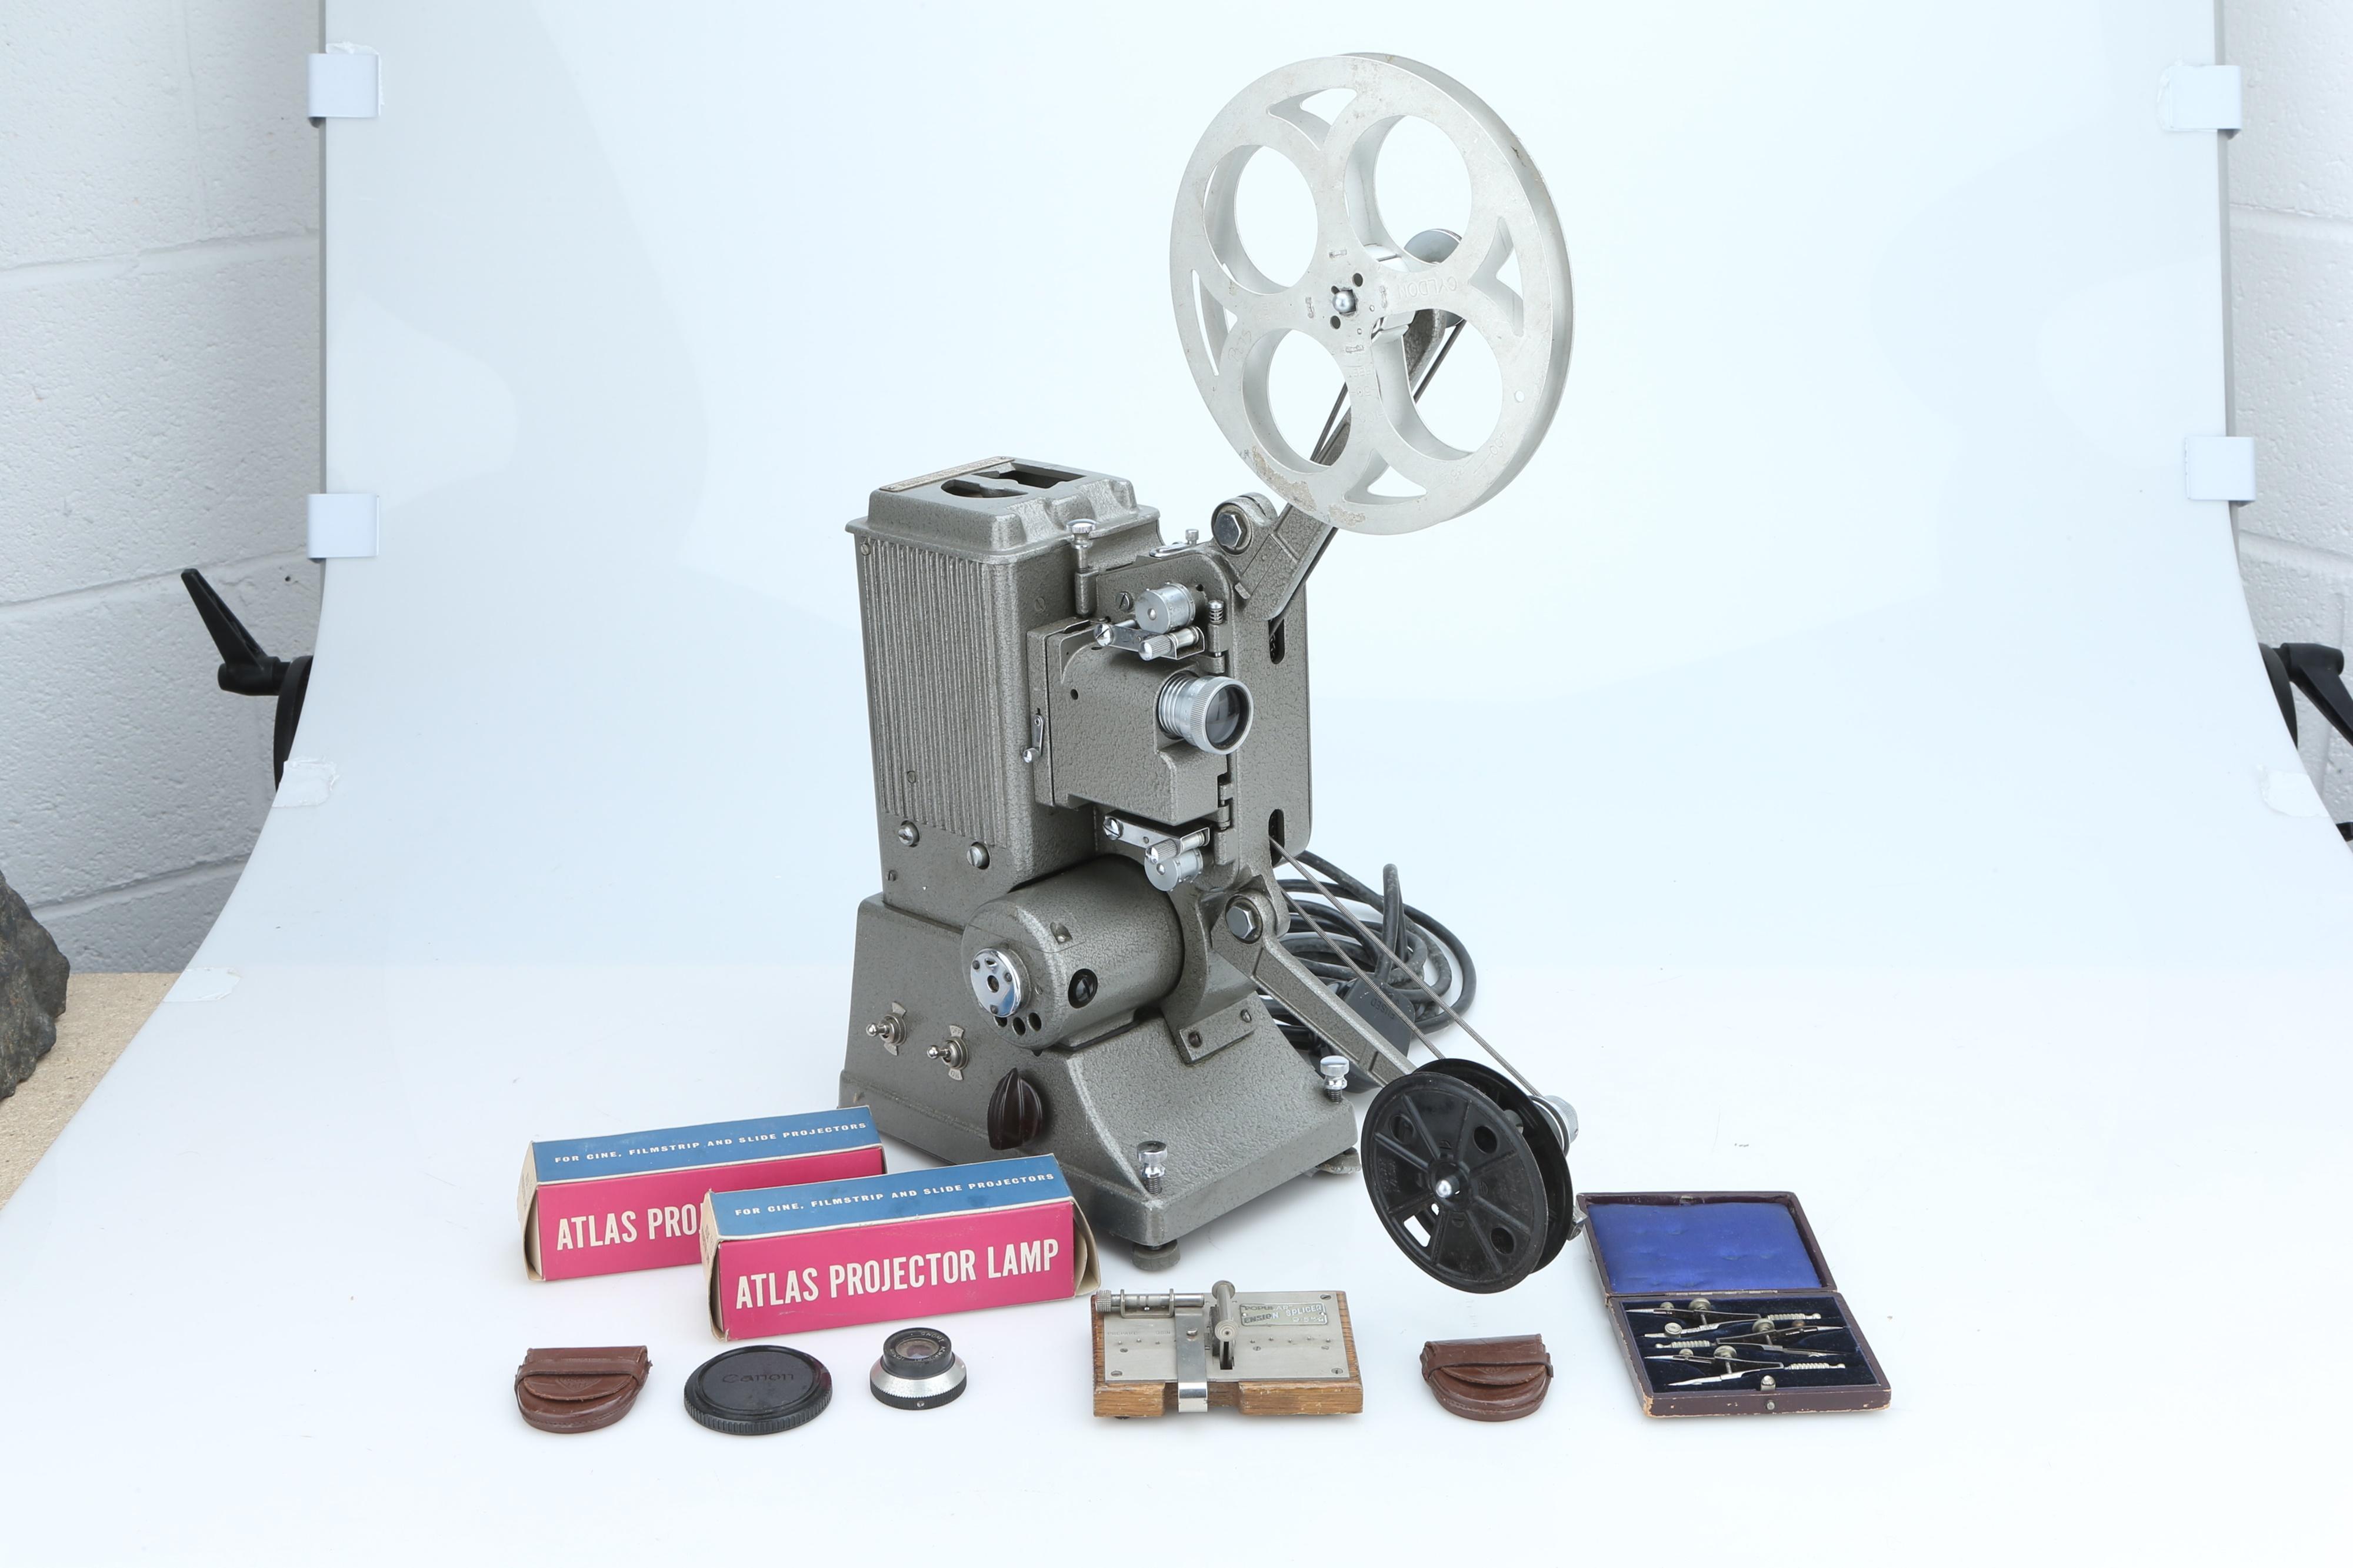 A Spectro Cine Projector,